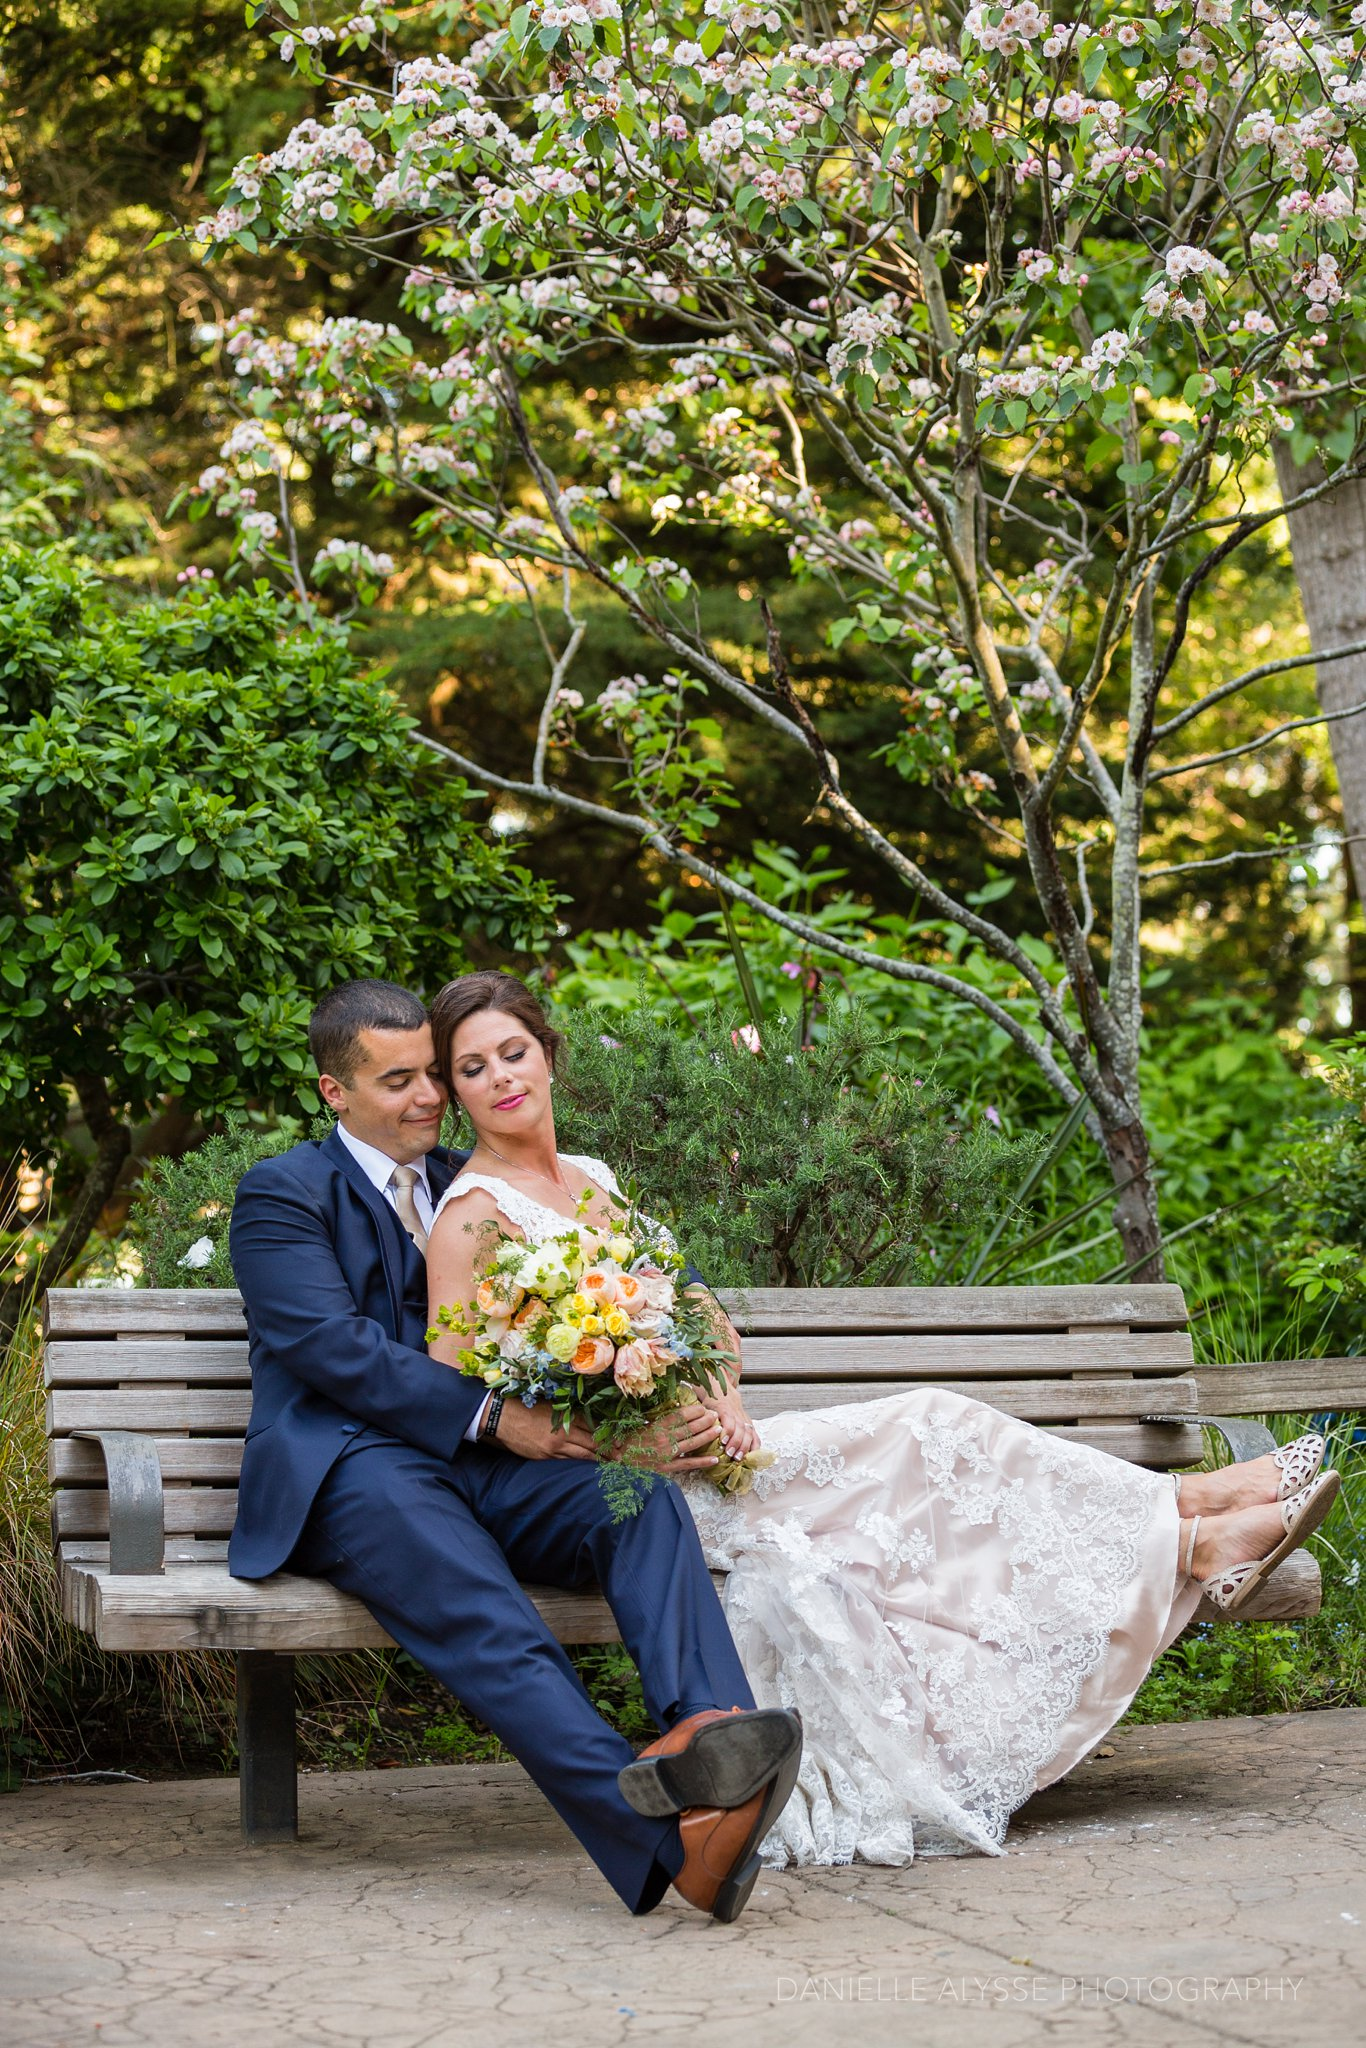 170429_blog_kimberly_ben_wedding_san_mateo_curiodyssey_danielle_alysse_photography_sacramento_photographer0422_WEB.jpg